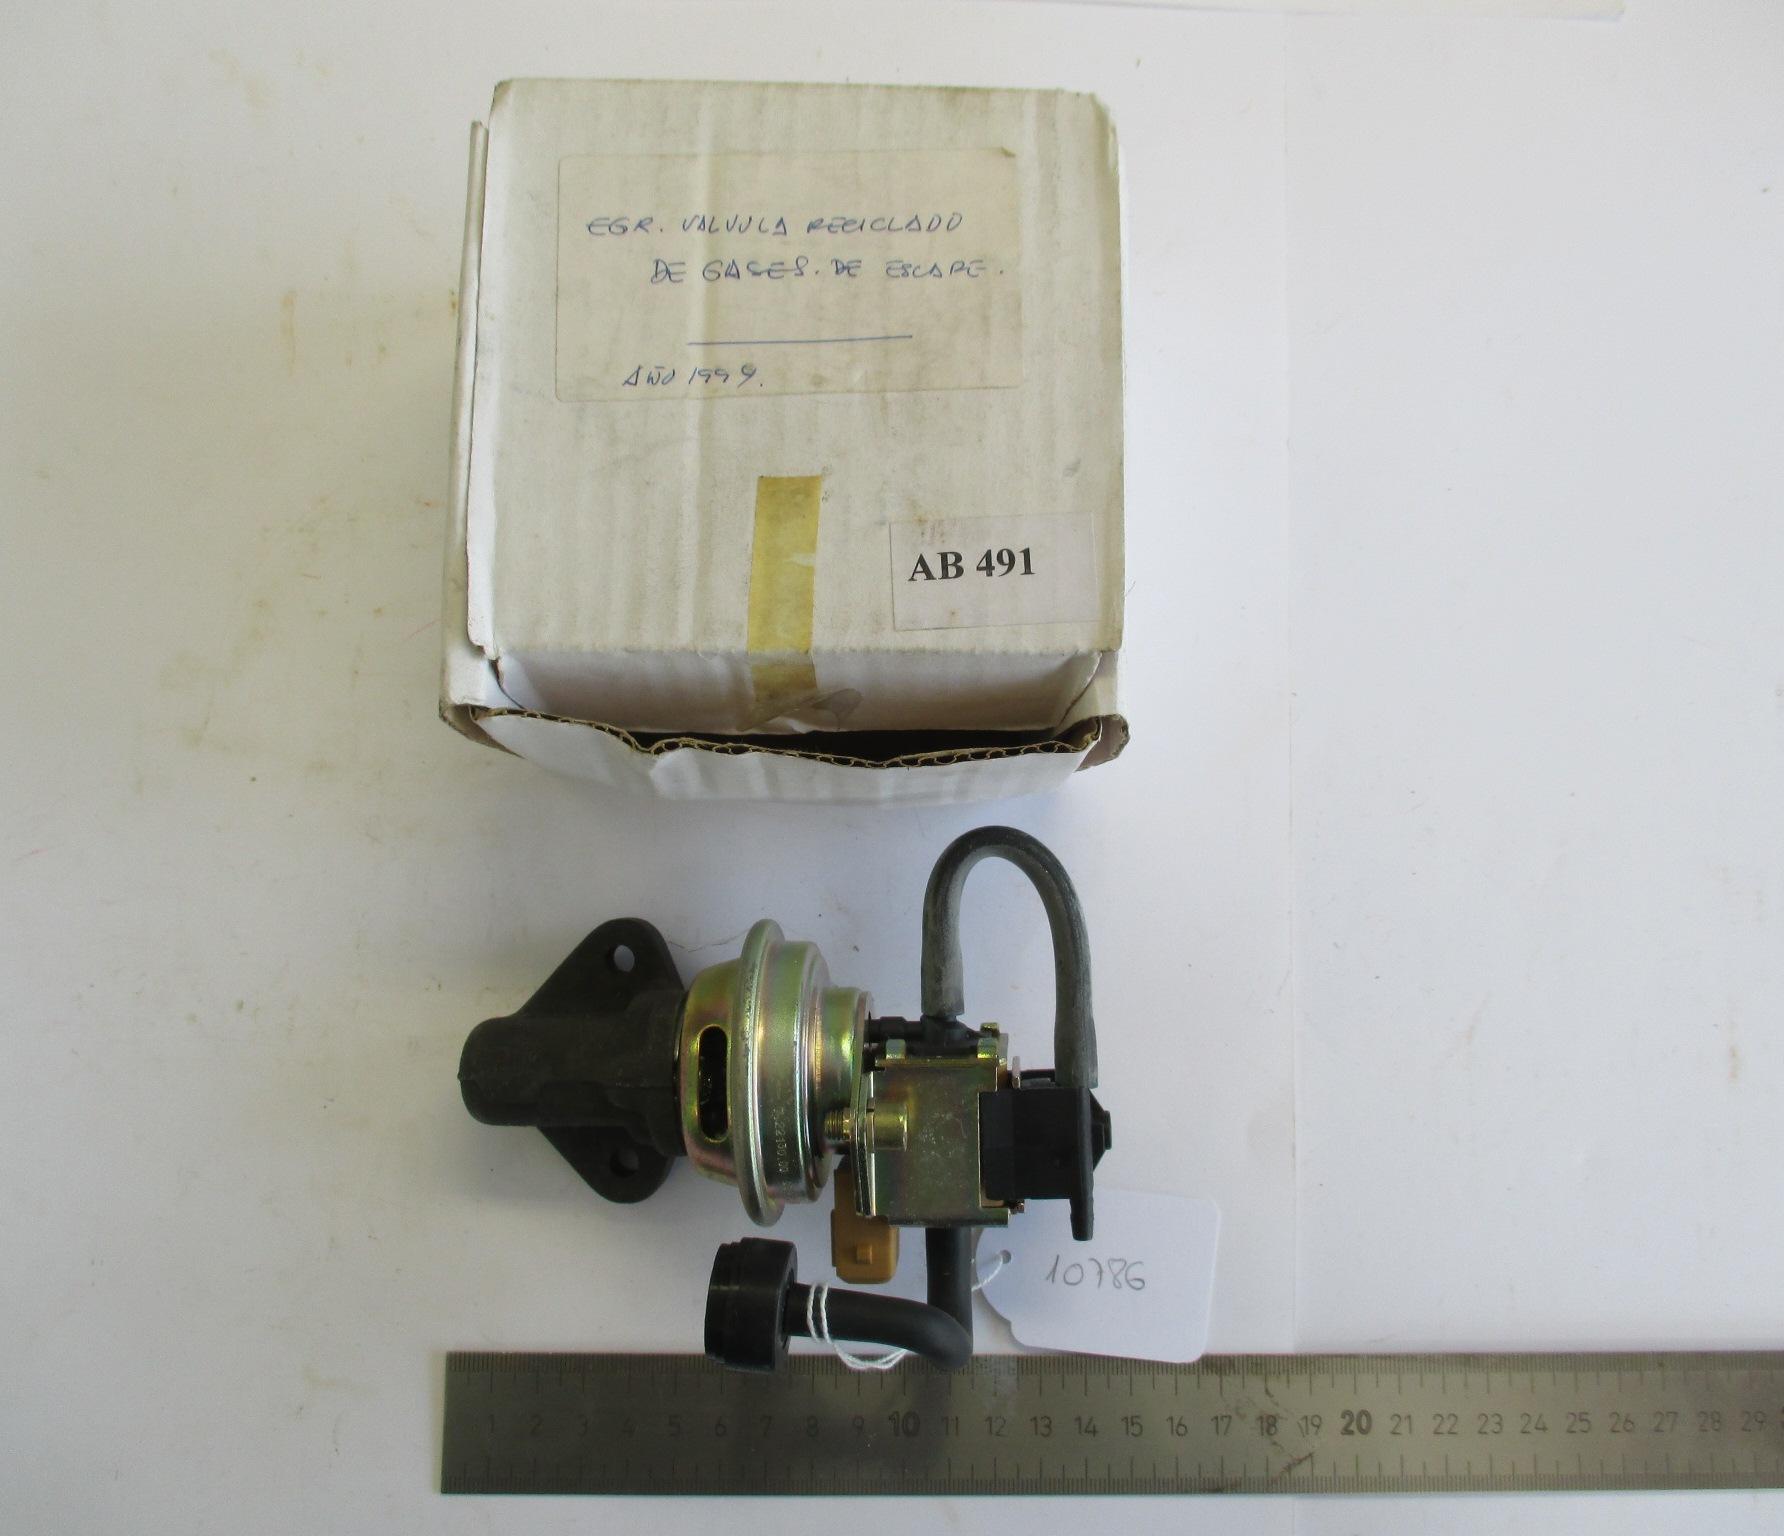 EGR. Válvula reciclado de gases de escape.